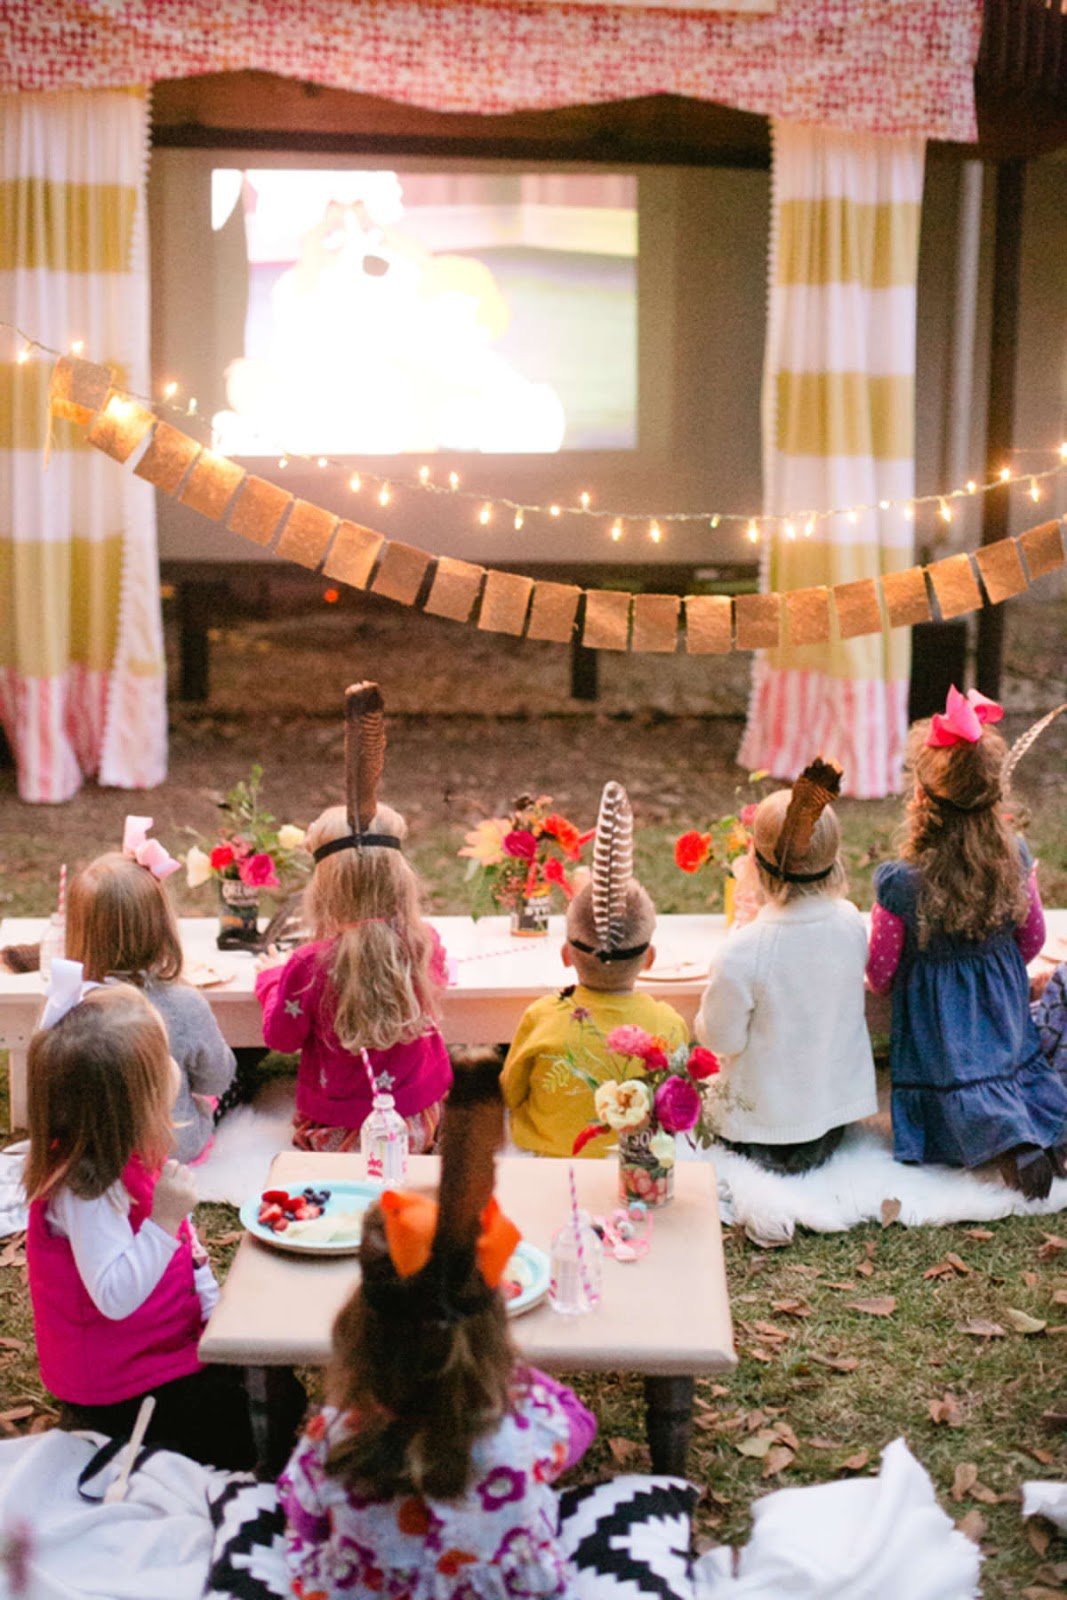 9 Best Backyard Decorating Ideas for Kids Parties